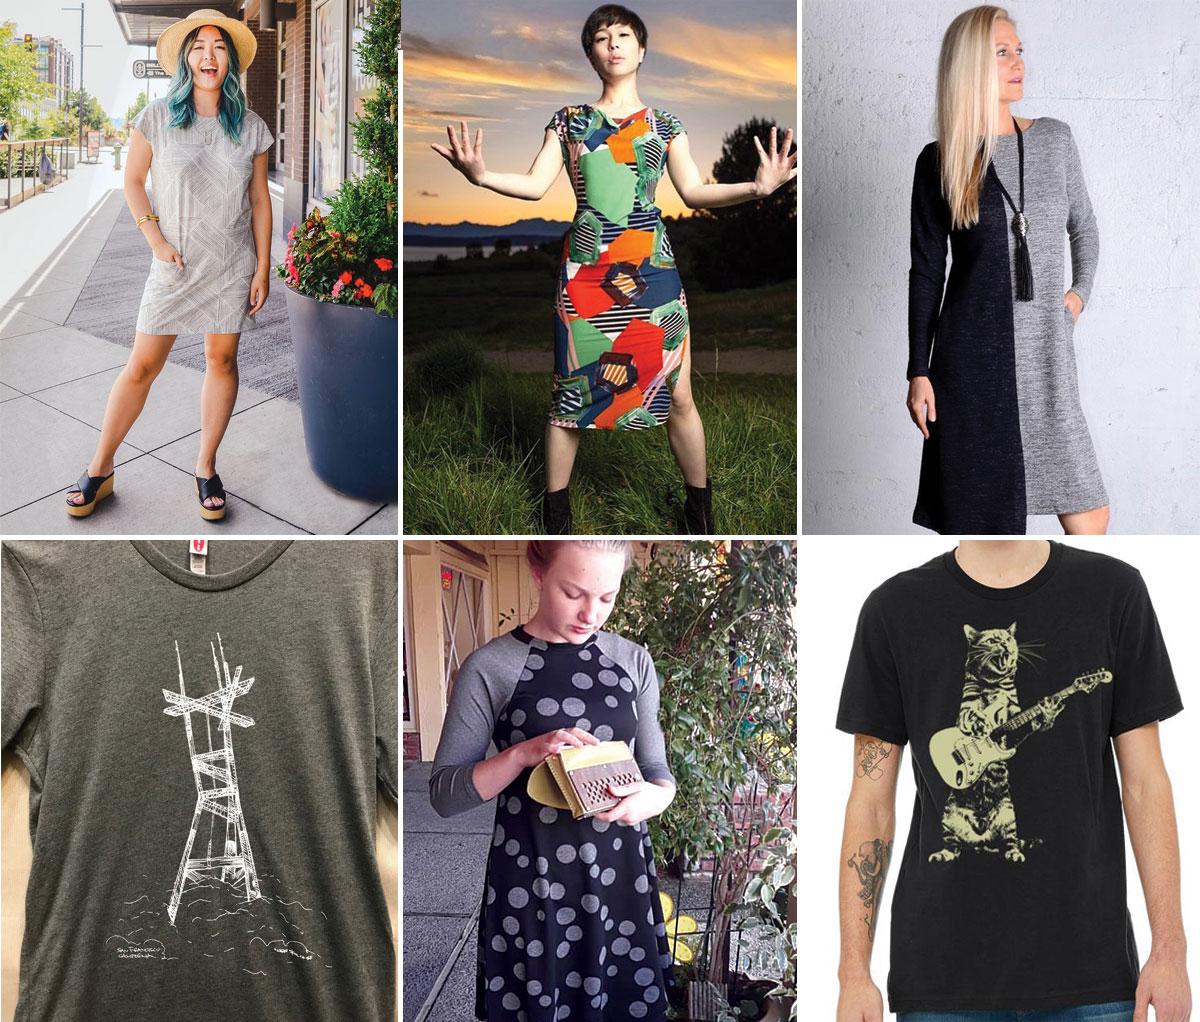 Dress by Harumi K, dress by KFLY, dress by gr.dano t-shirt by New Skool, dress by Kopolo, t-shirt by Mission Thread